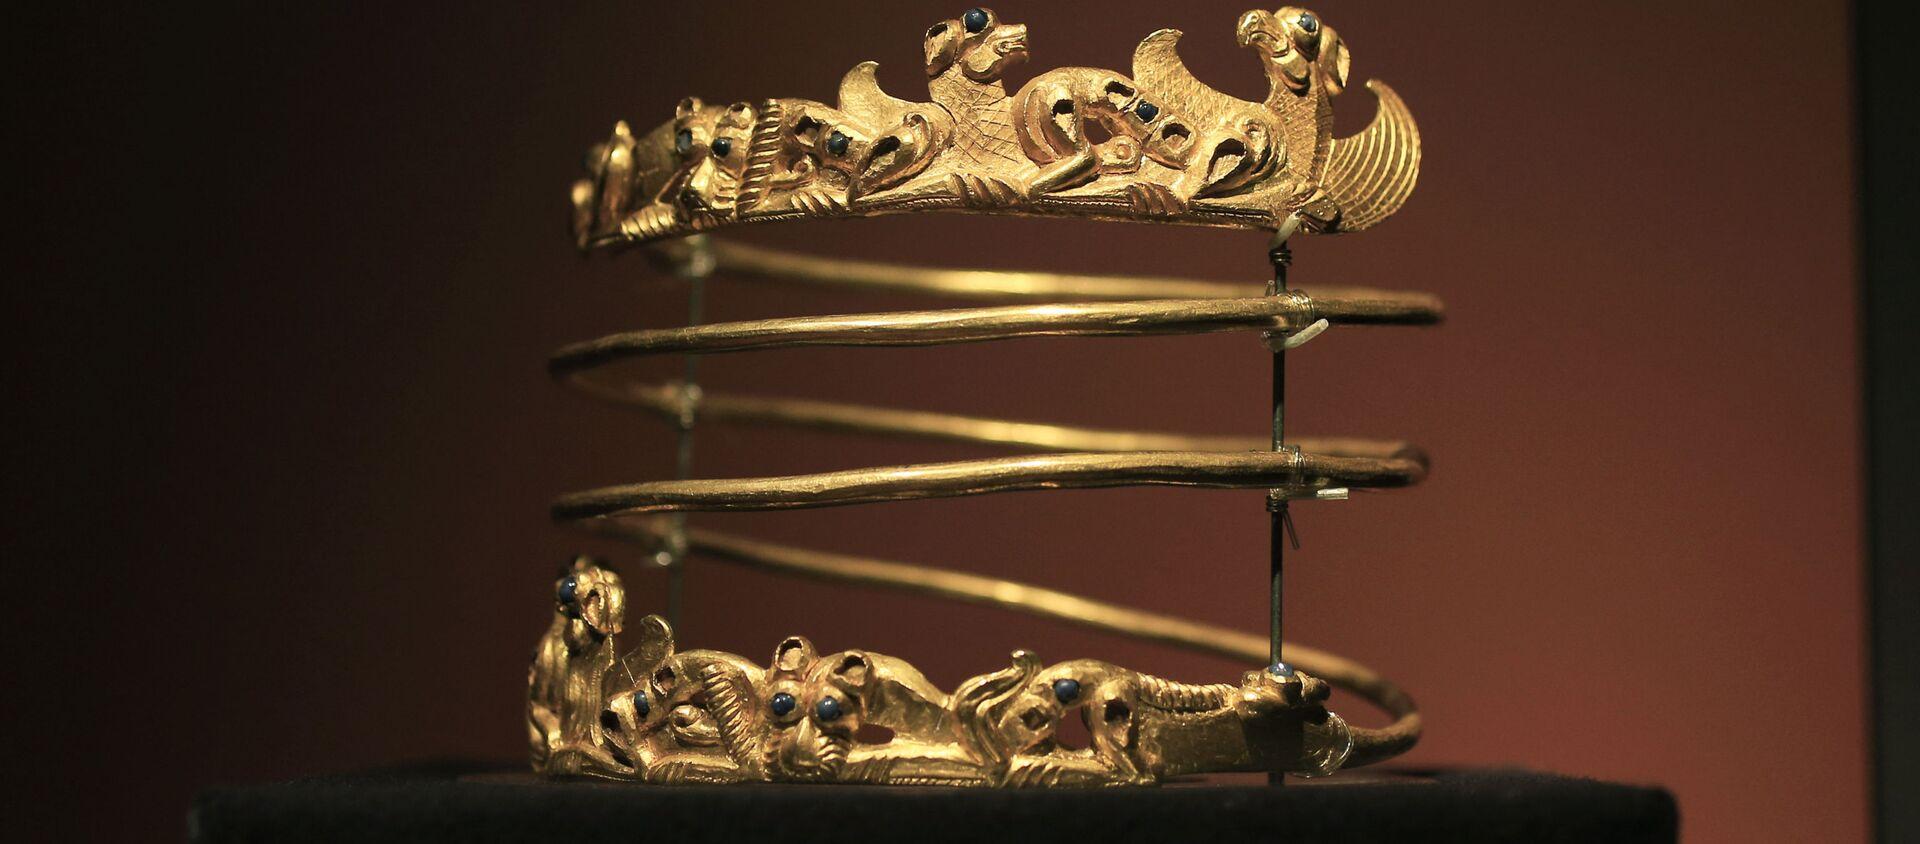 vàng Scythia - Sputnik Việt Nam, 1920, 26.08.2019